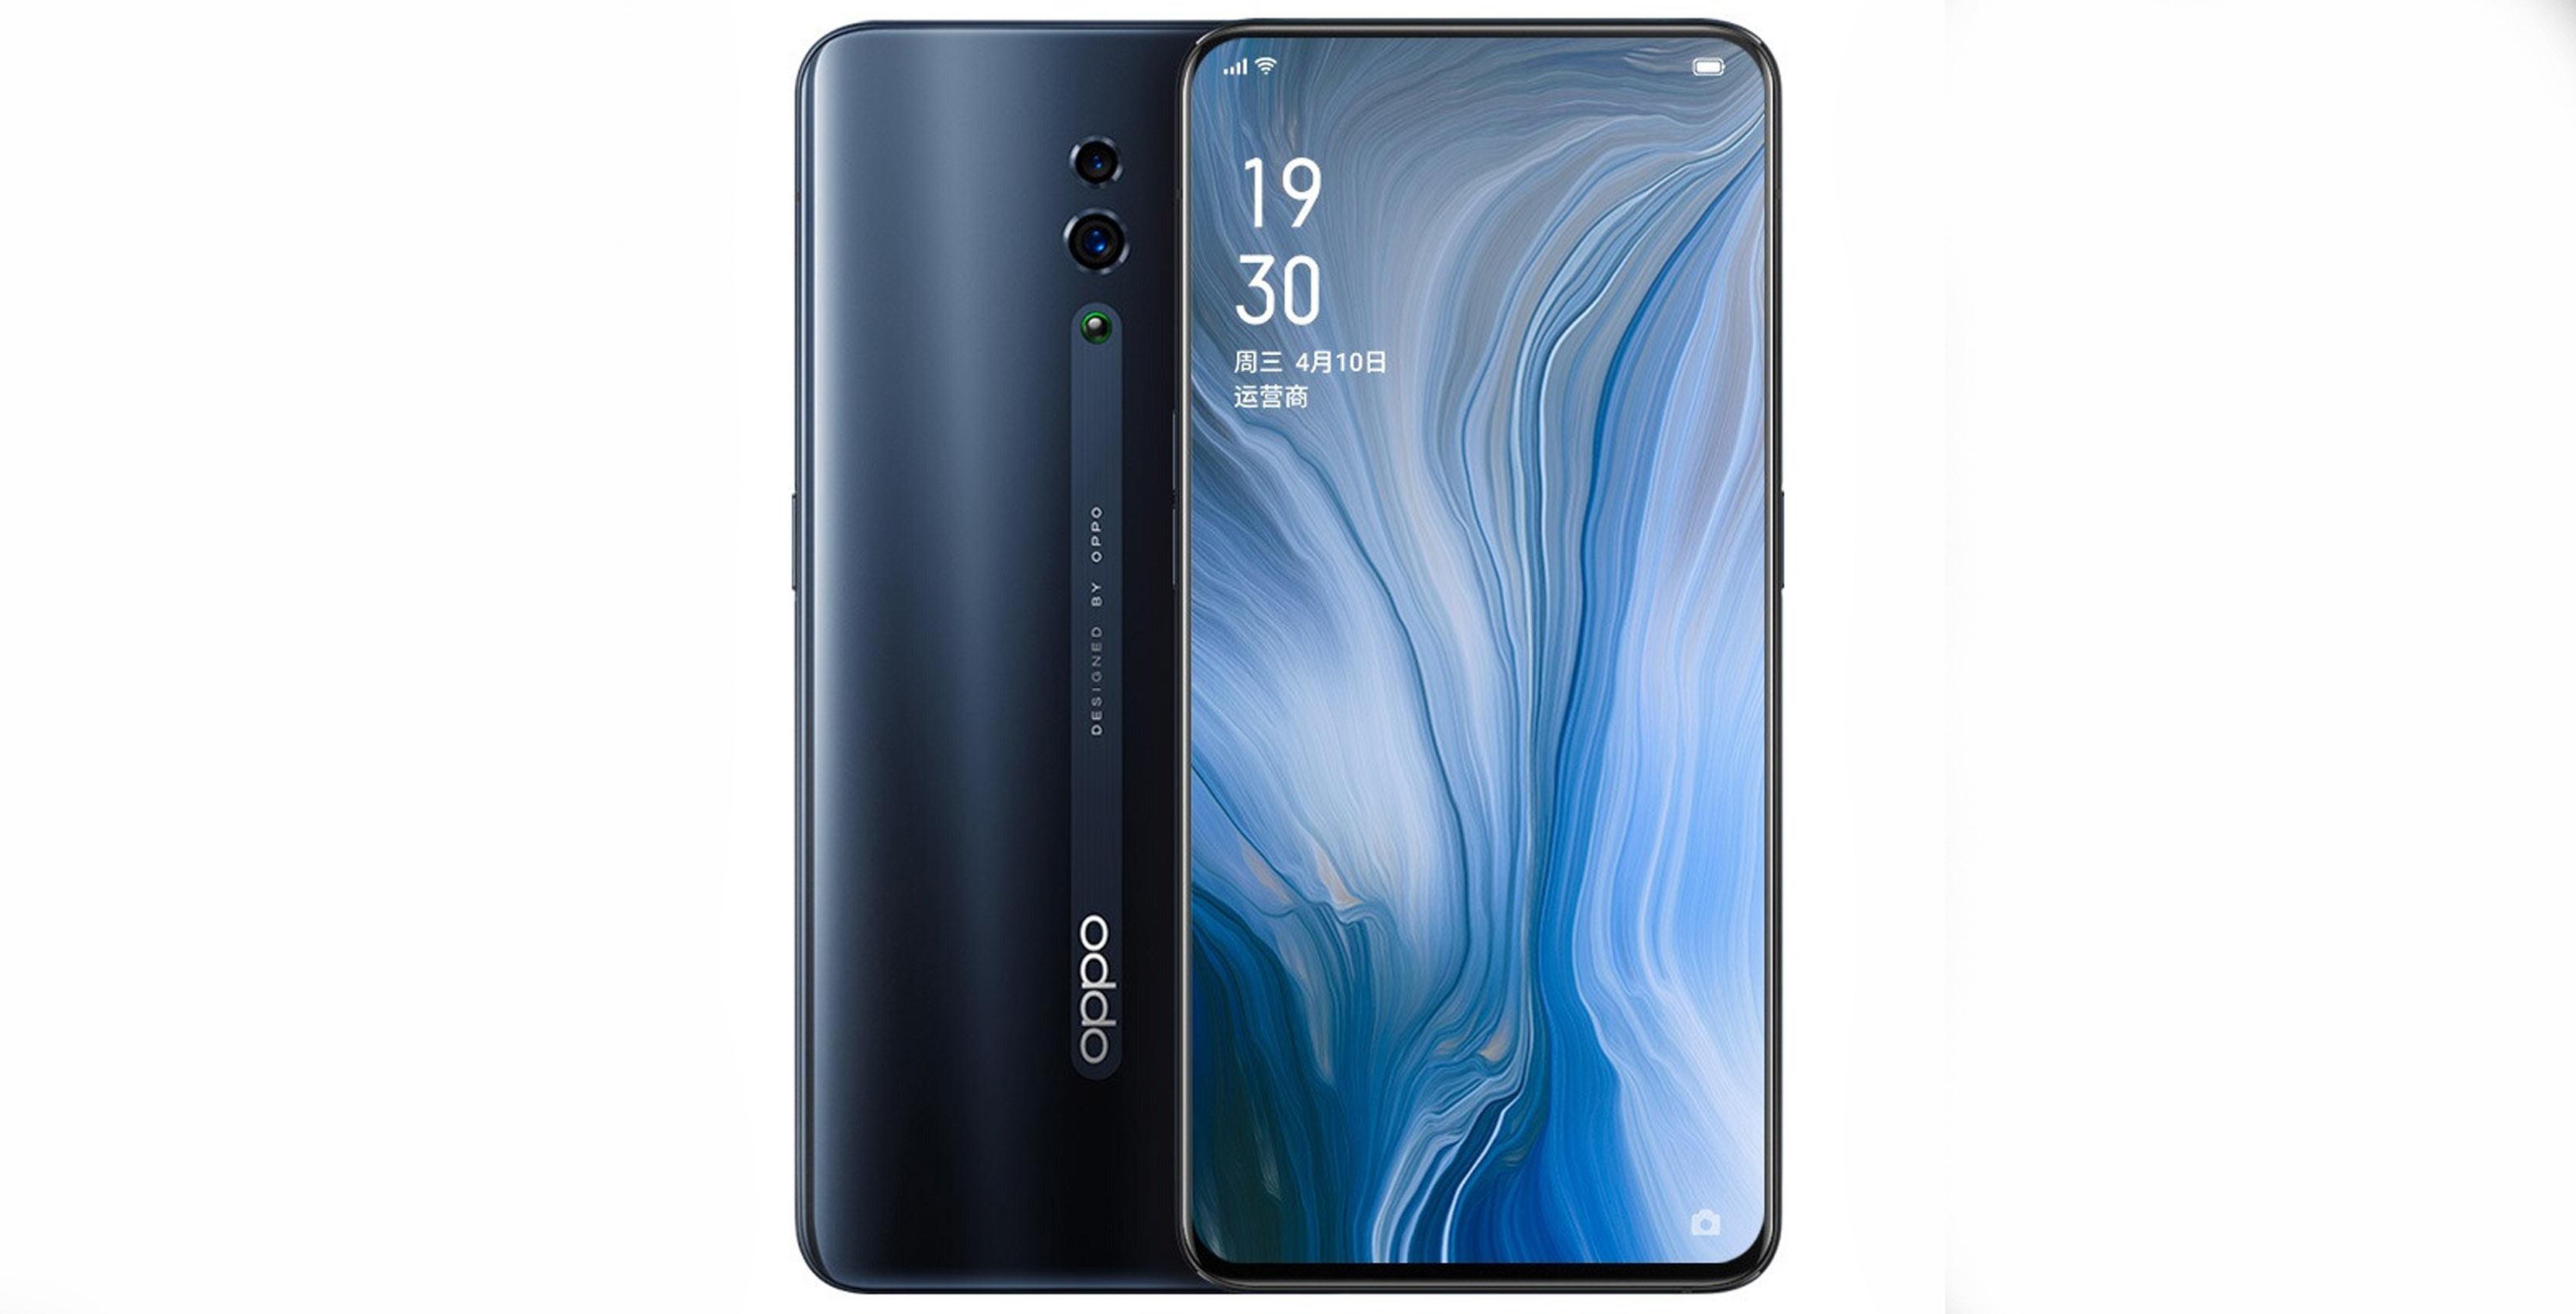 Oppo's upcoming Reno smartphone